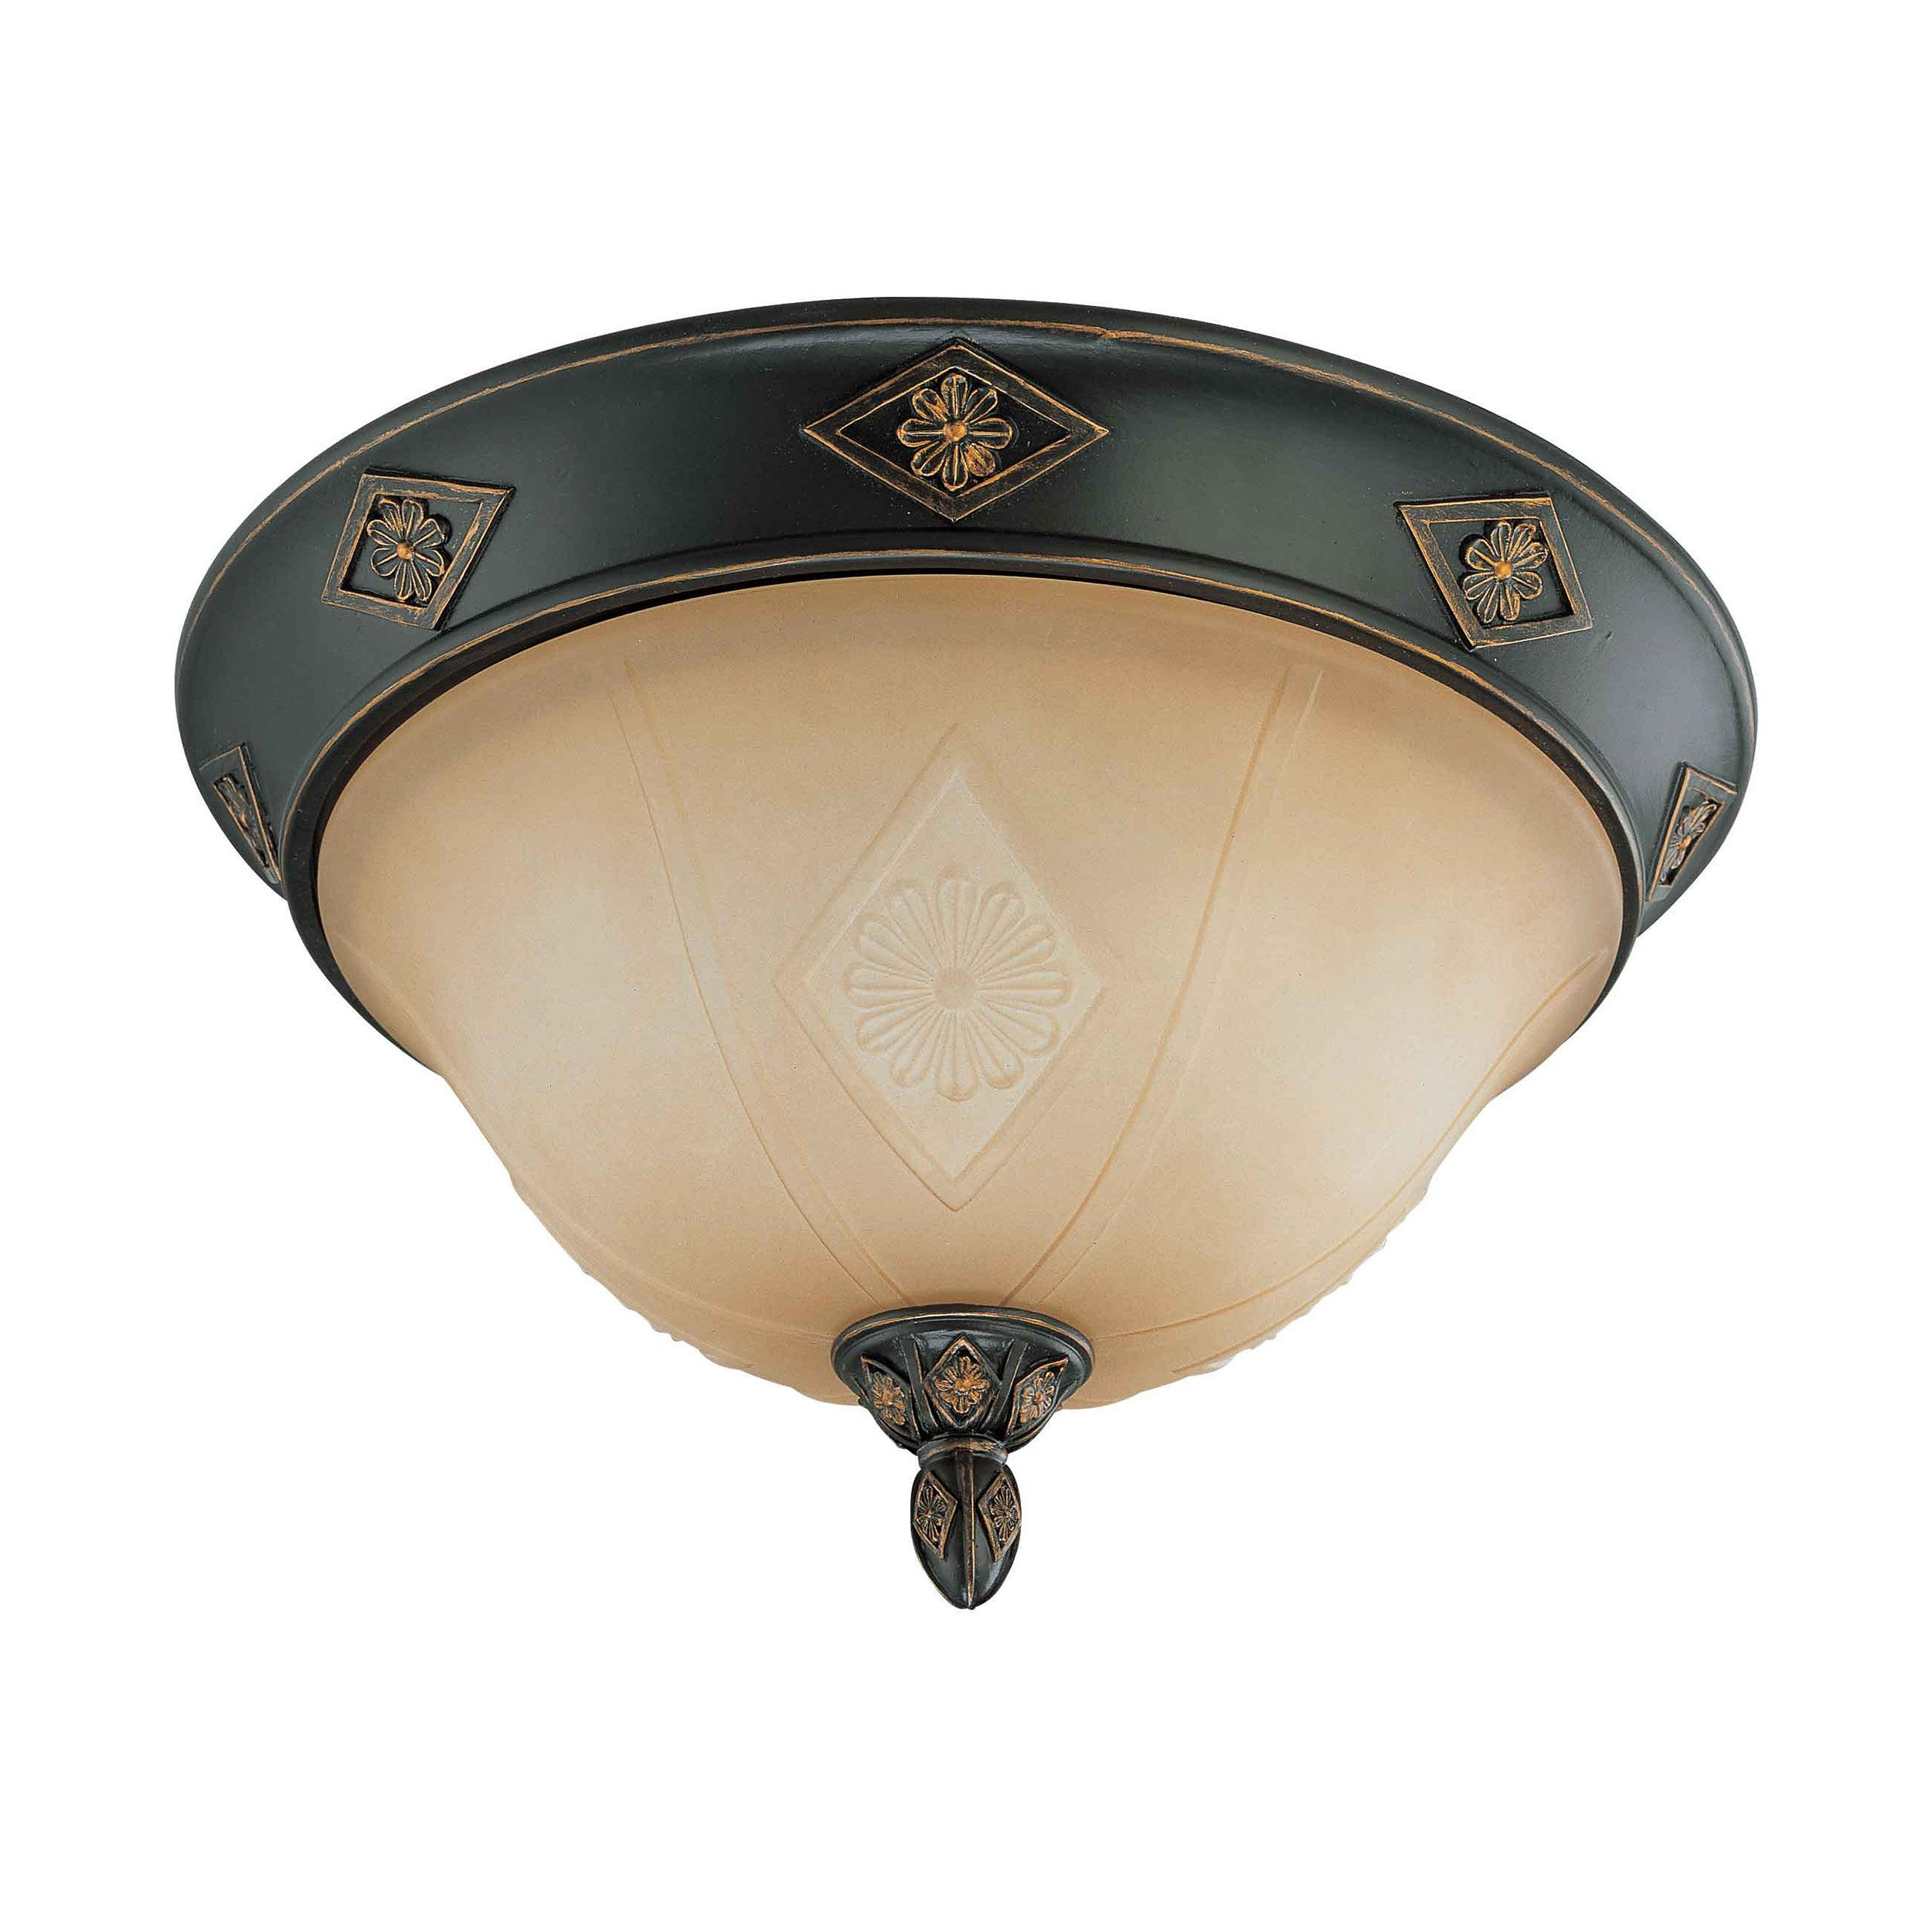 Brussells 2 Light 13 inch Flush Dome Belgium Bronze with Fresco Glass